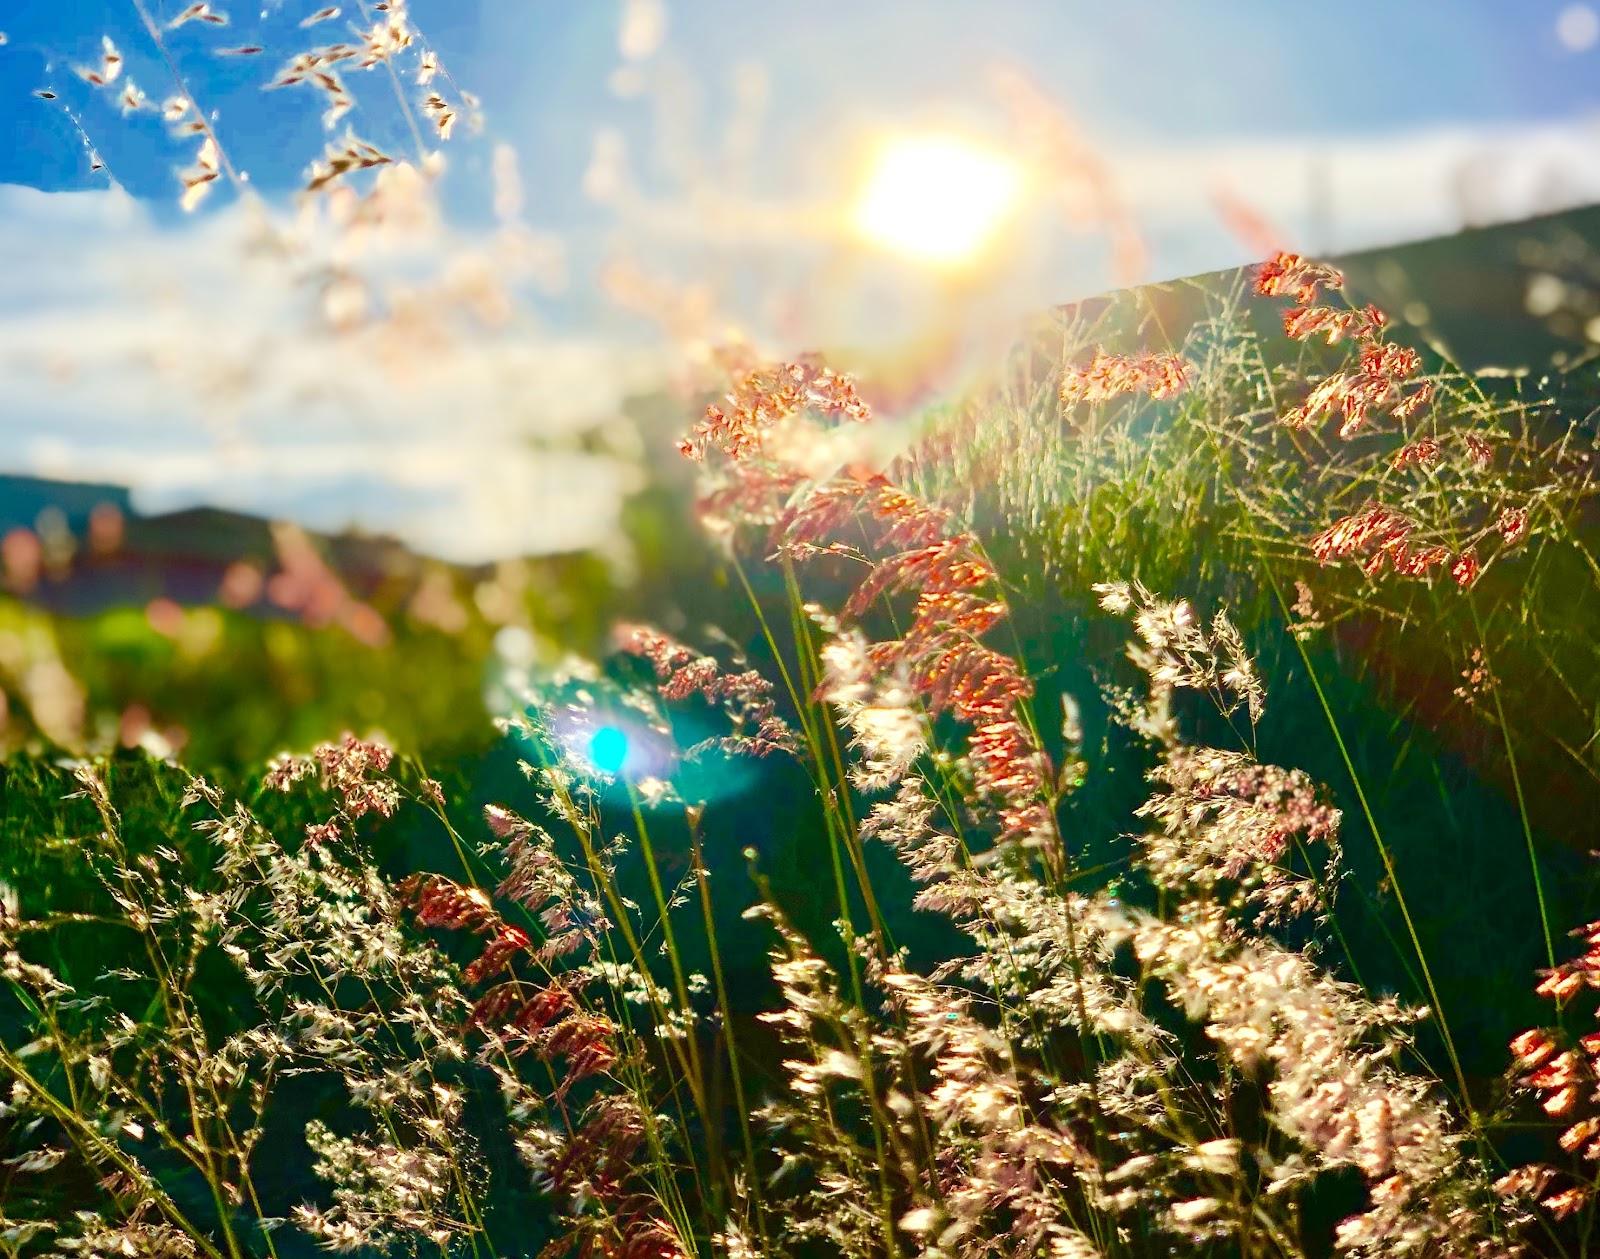 meadows in spring